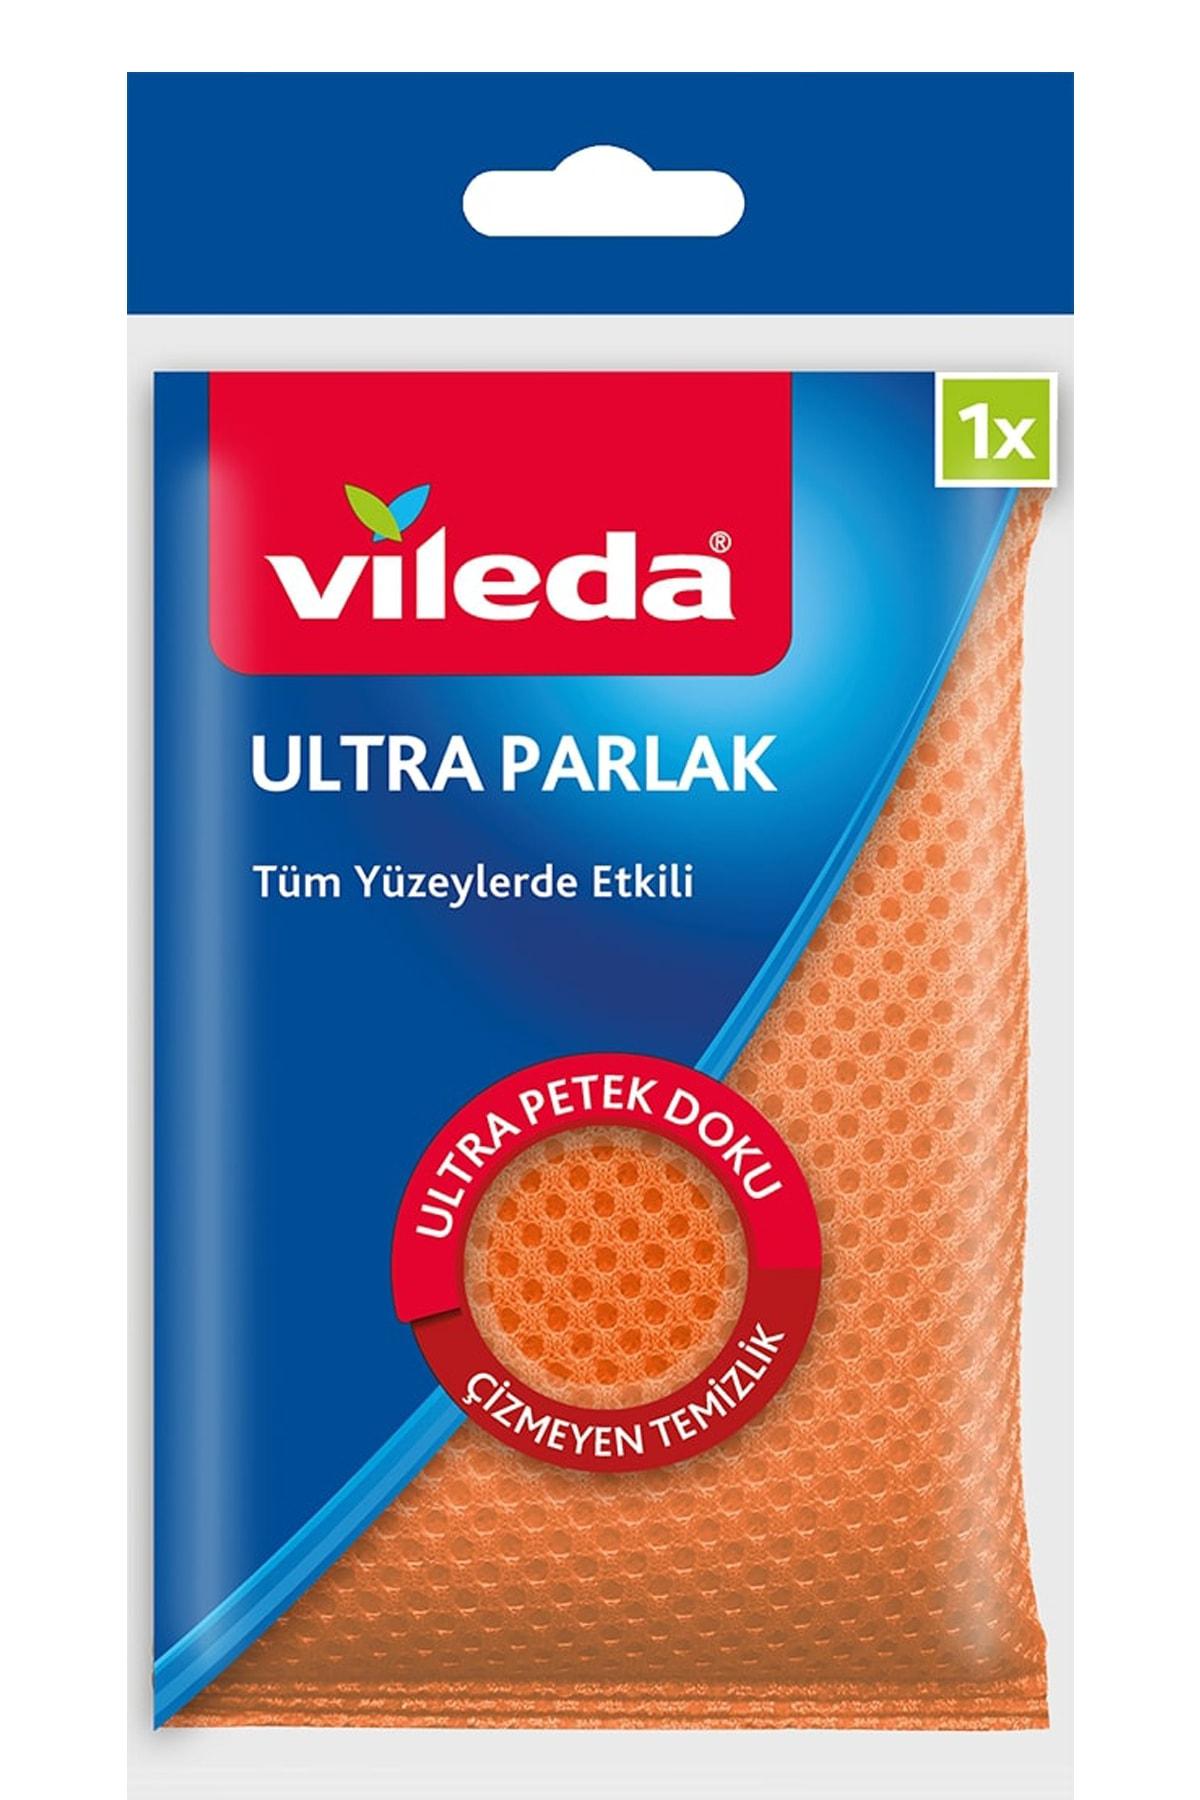 VILEDA ULTRA PARLAK SUNGER